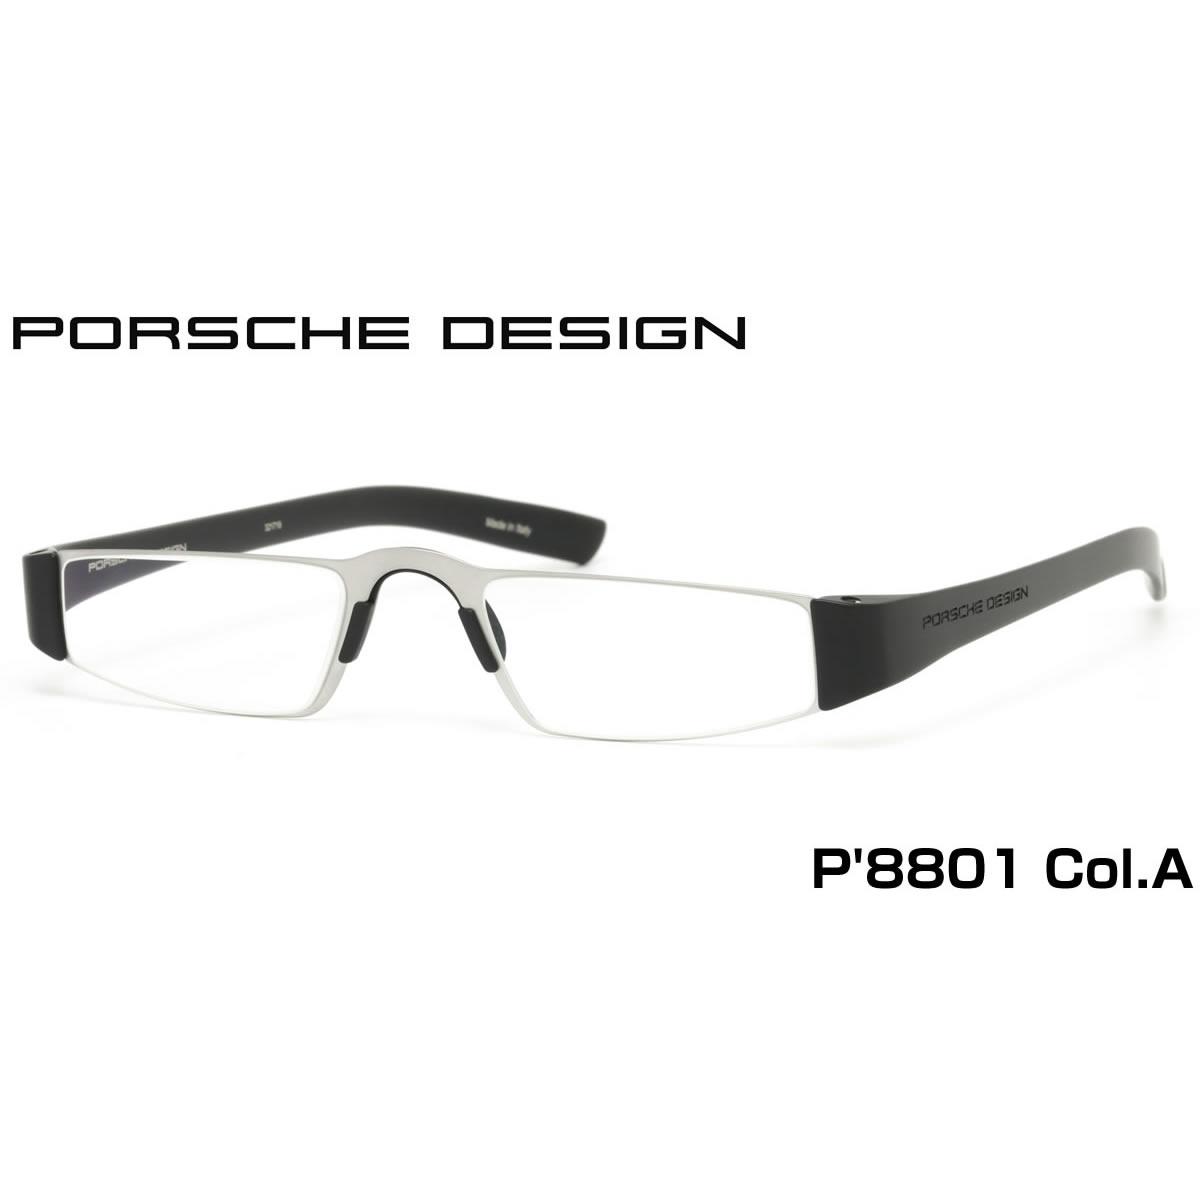 P8801-A PORSCHE DESIGN ポルシェデザイン リーディンググラス 老眼鏡 メンズ レディース プレゼントにも最適! [ACC]